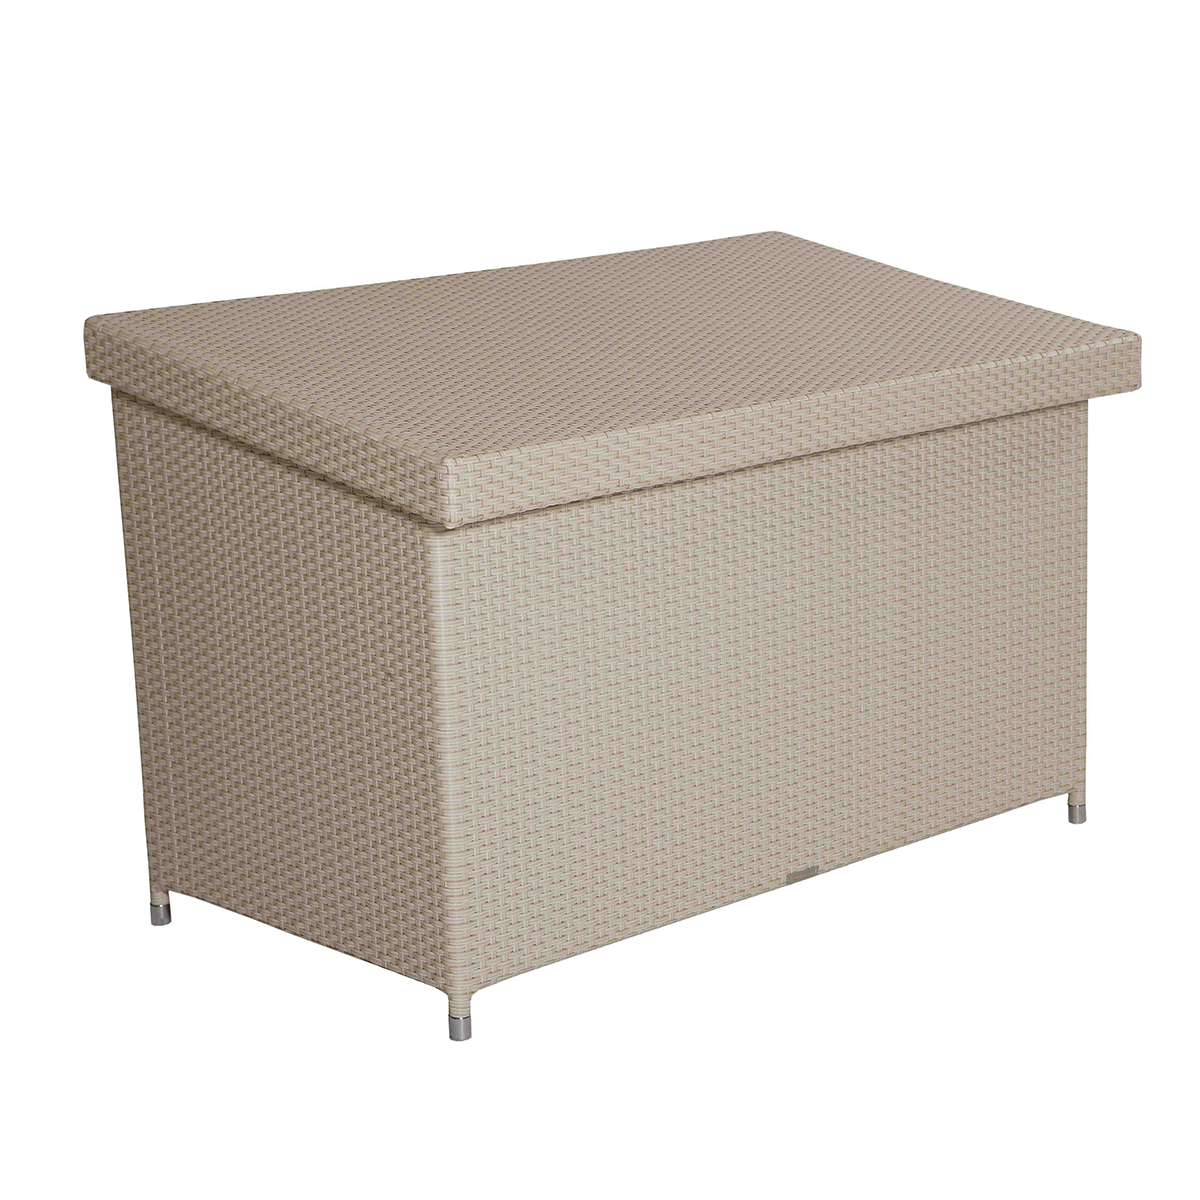 Relaxia cushion box - на 360.ru: цены, описание, характеристики, где купить в Москве.